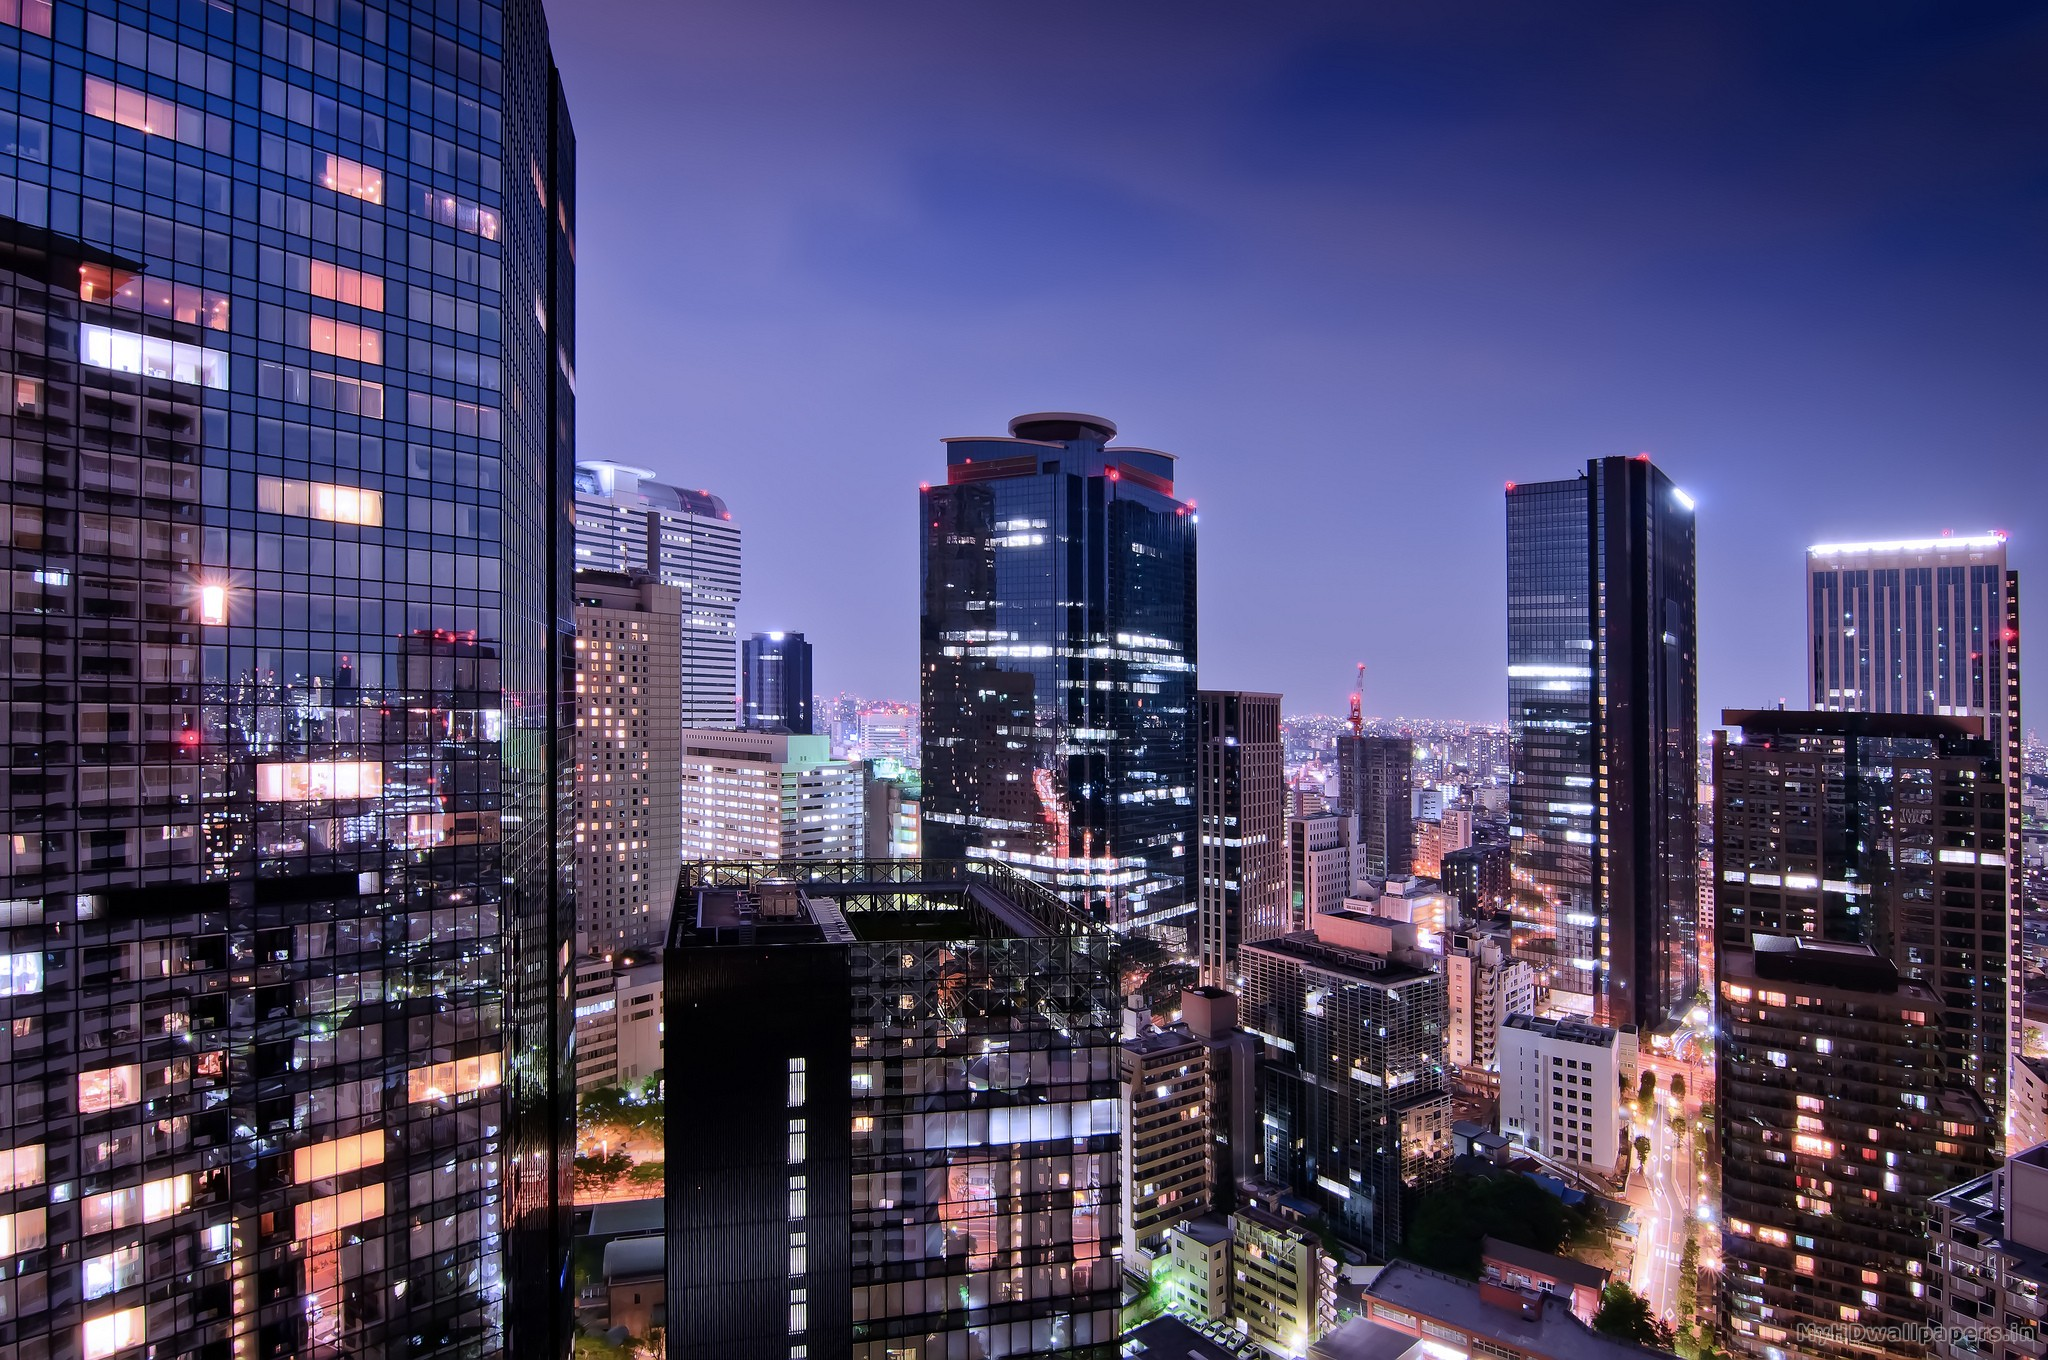 Japan Tokyo City HD Wallpapers MyHDwallpapersin Wallpaper in Pixels 2048x1360